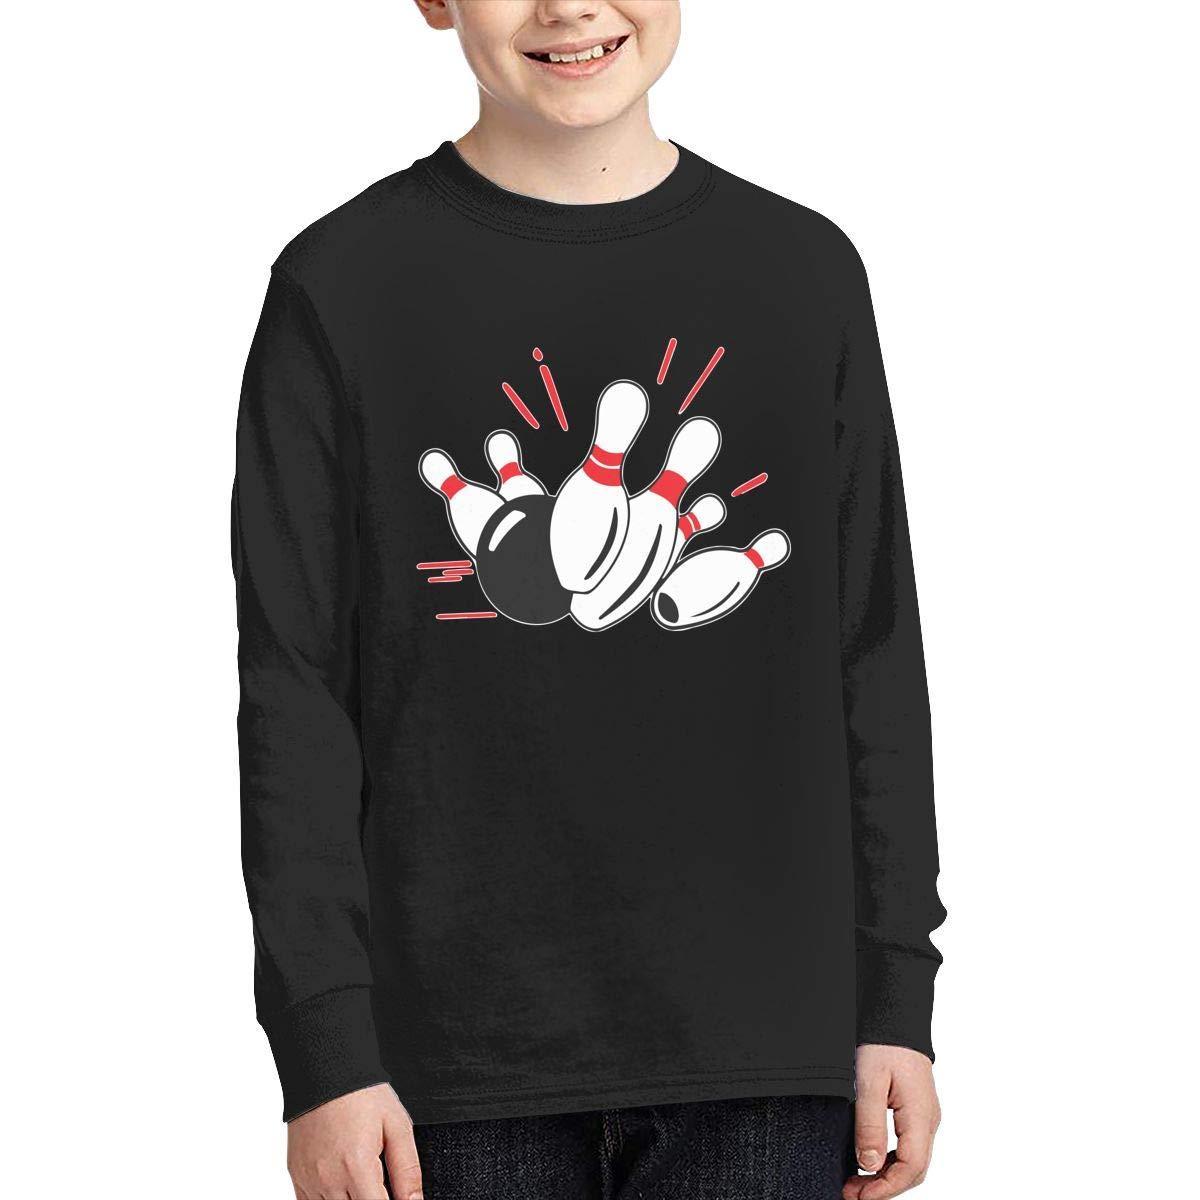 Teenagers Teen Boy Bowling Printed Long Sleeve 100/% Cotton Tee Shirt